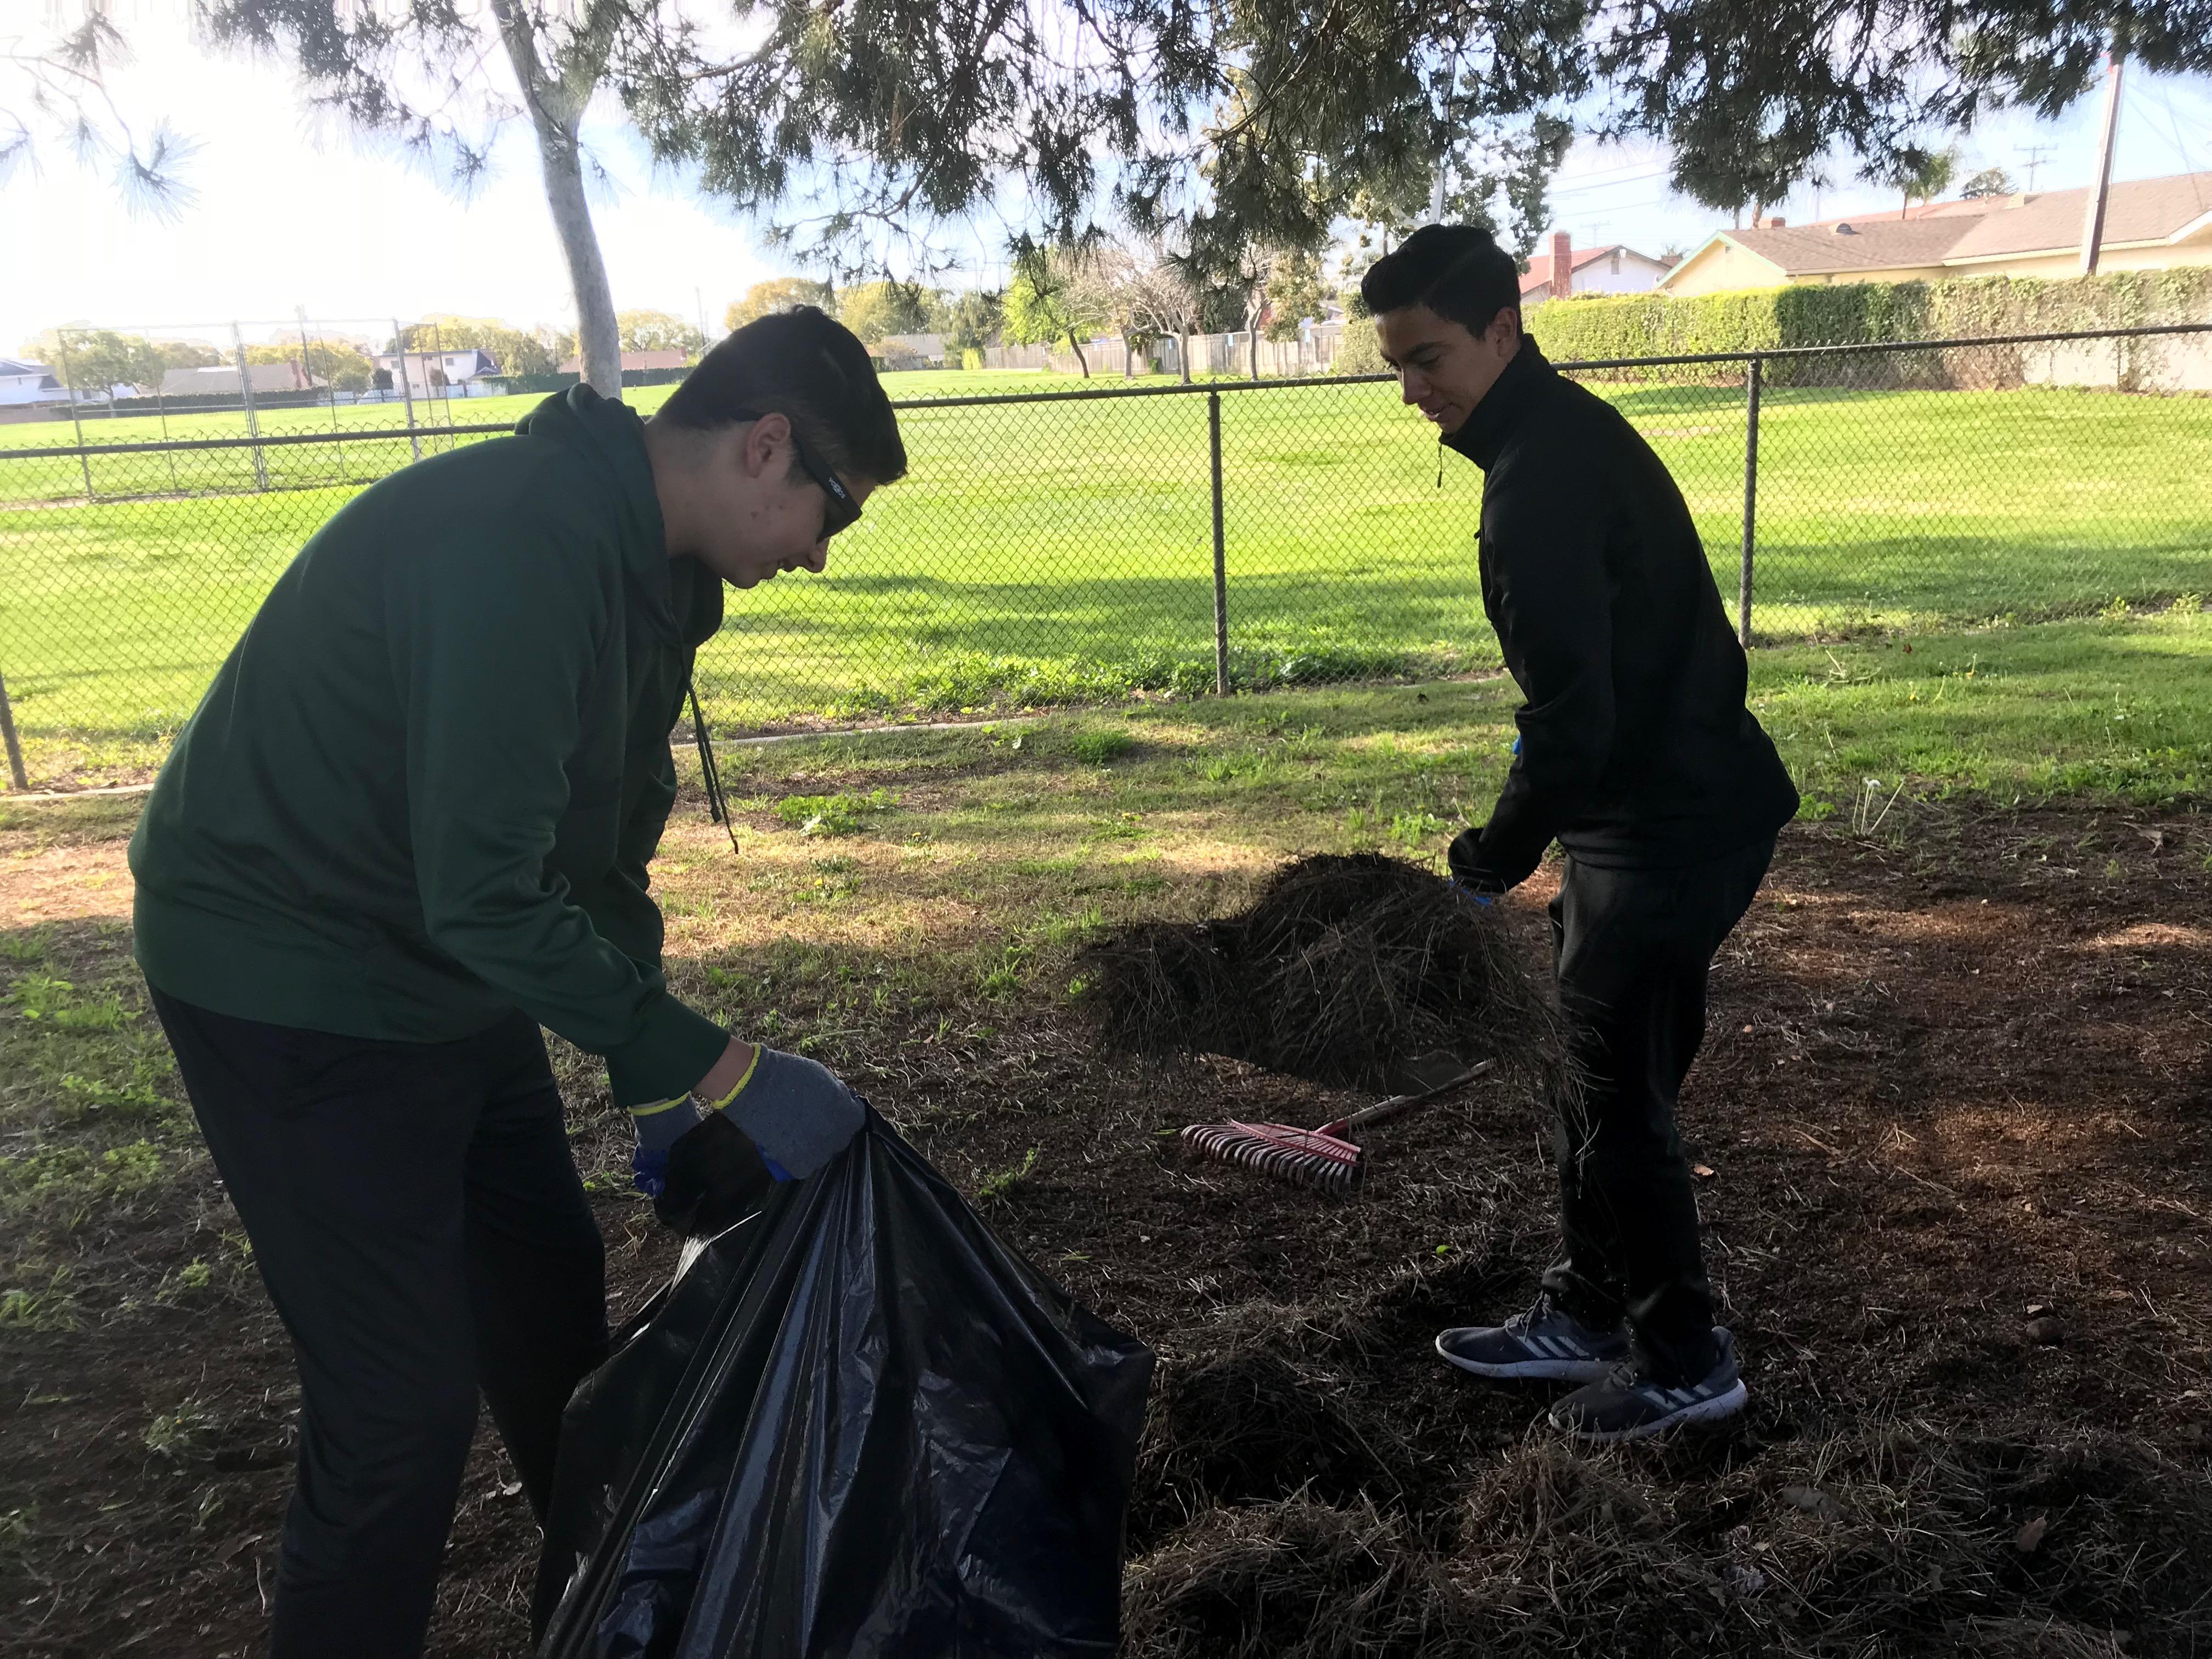 Community_Service_Day_2_13